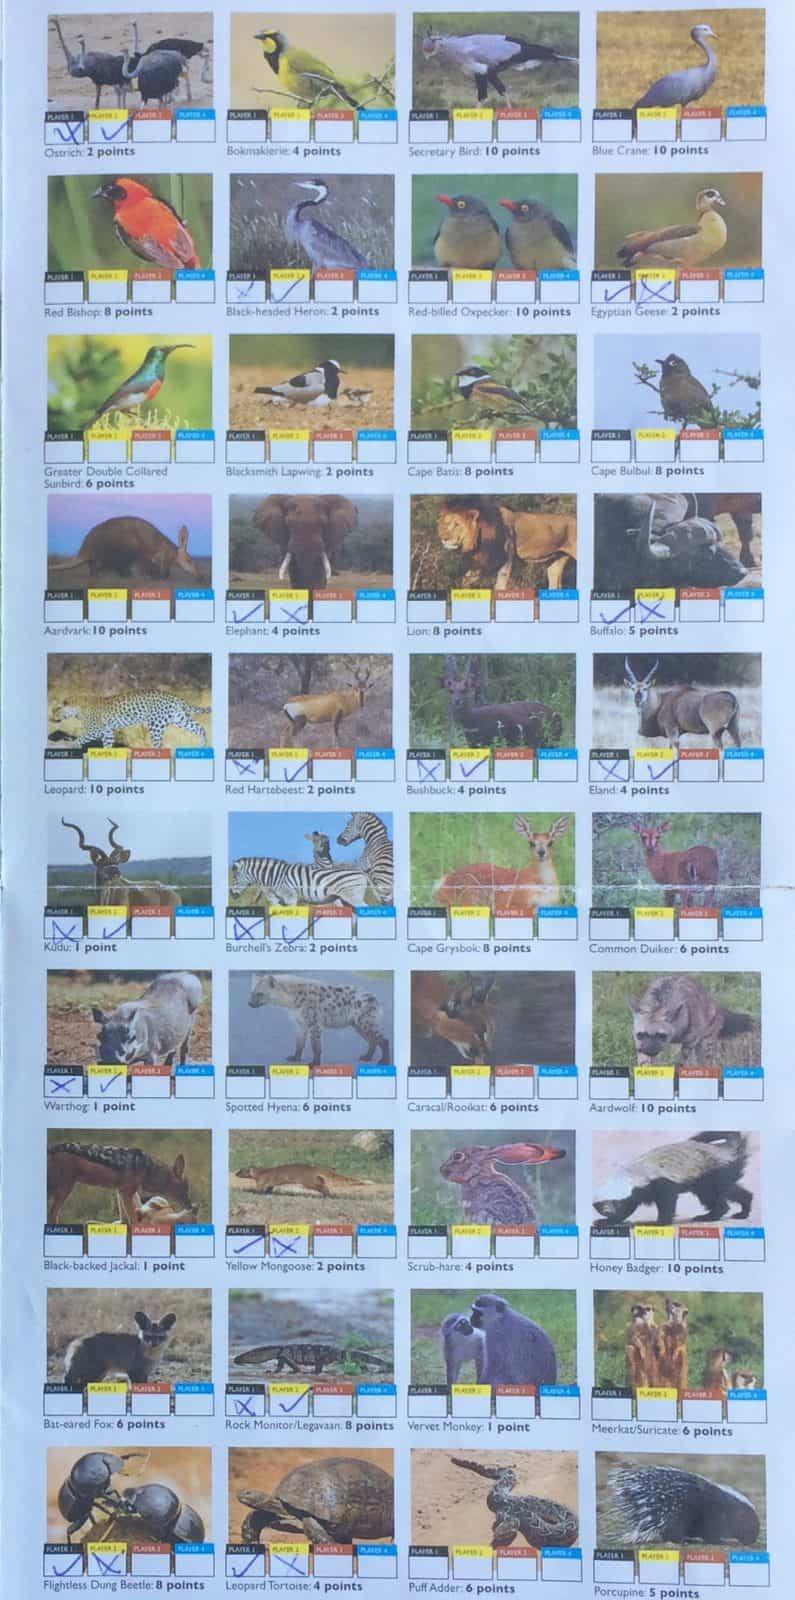 Addo Elephant National Park Tiere Animals Selbstfahrer Safari